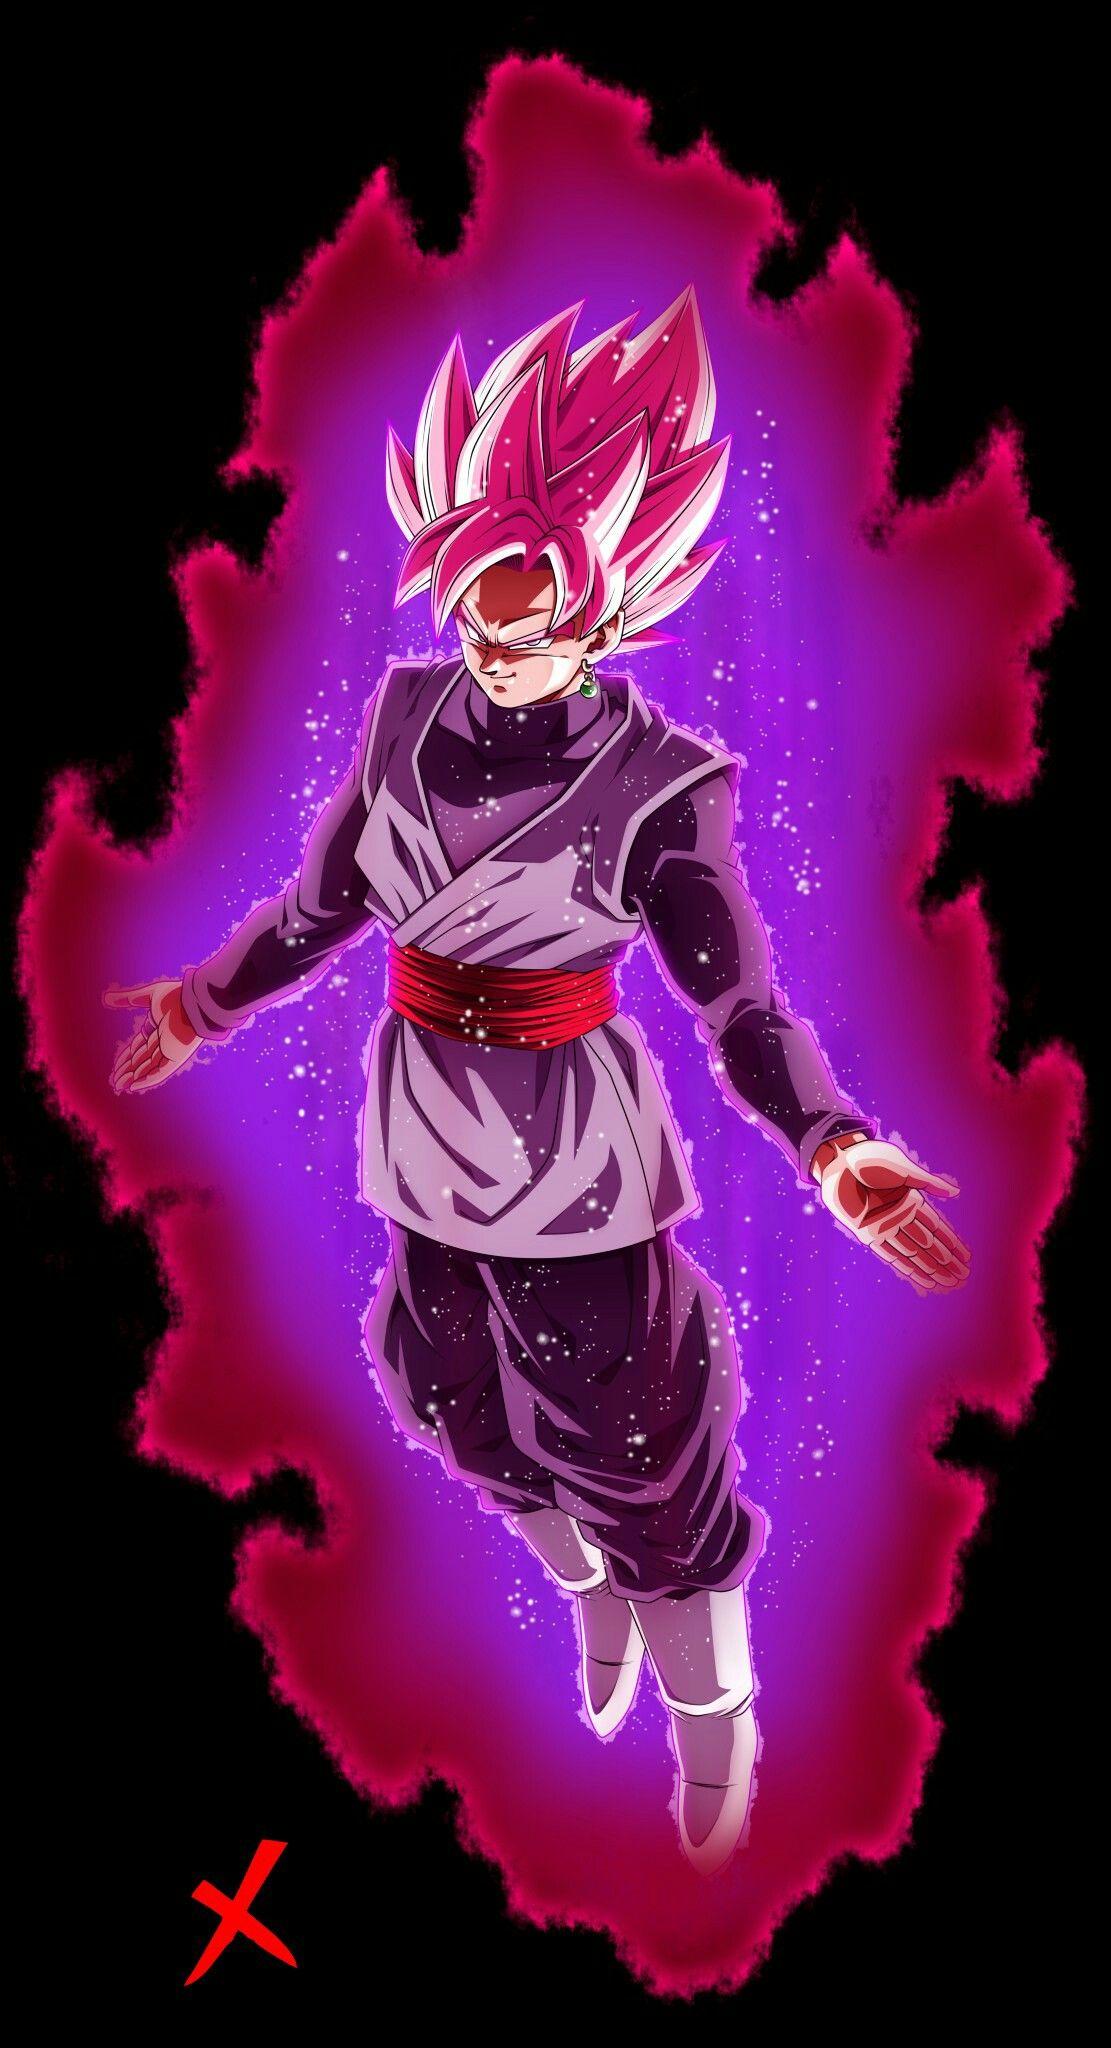 Goku Black Super Sayajin Rose Dragon Ball Super Anime Dragon Ball Super Dragon Ball Super Goku Goku Black